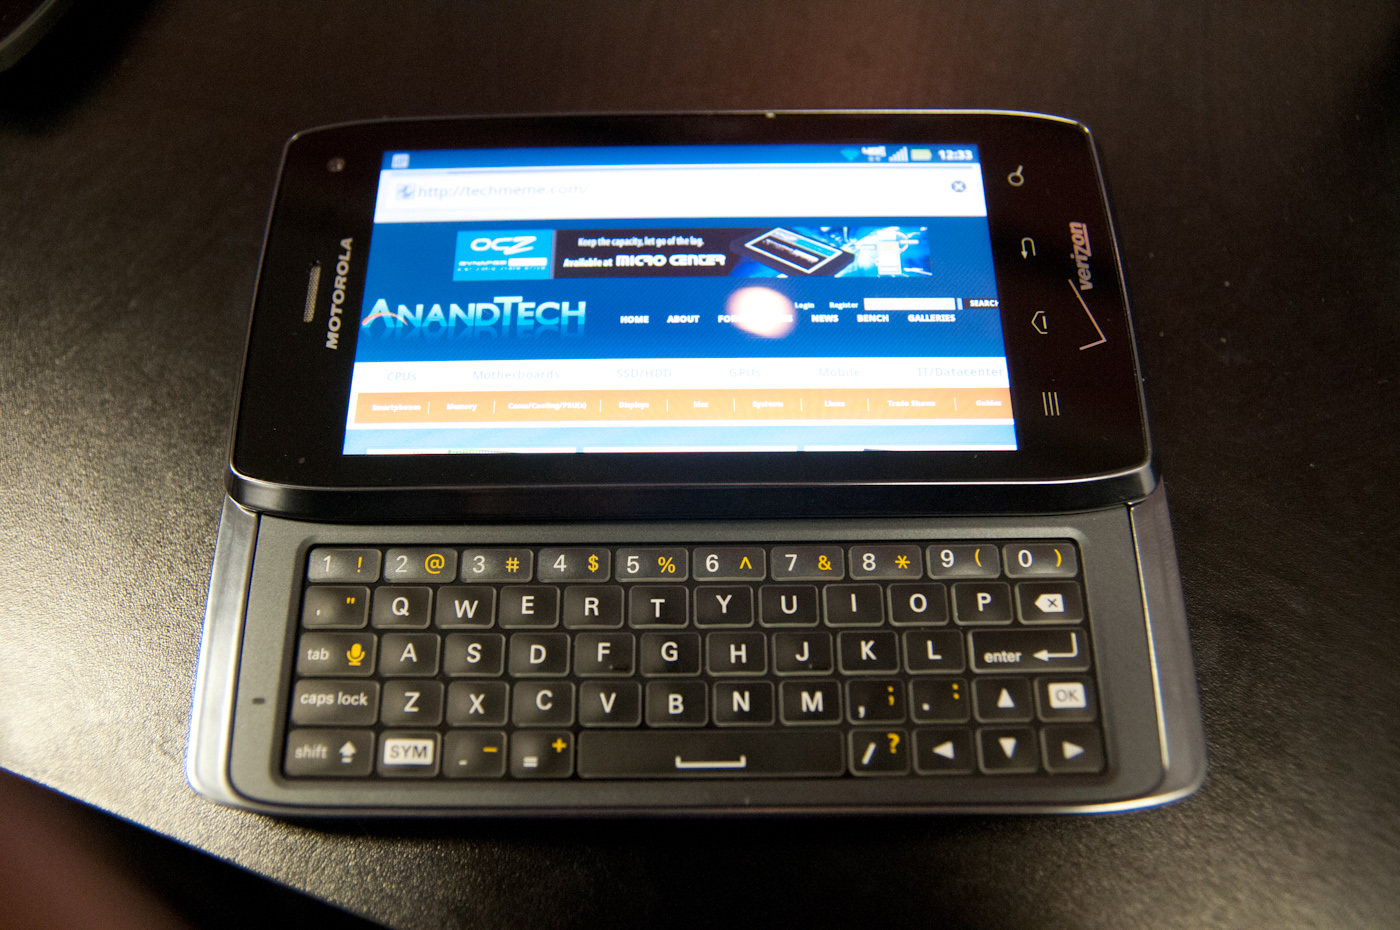 motorola smartphones 2012. motorola smartphones 2012 g